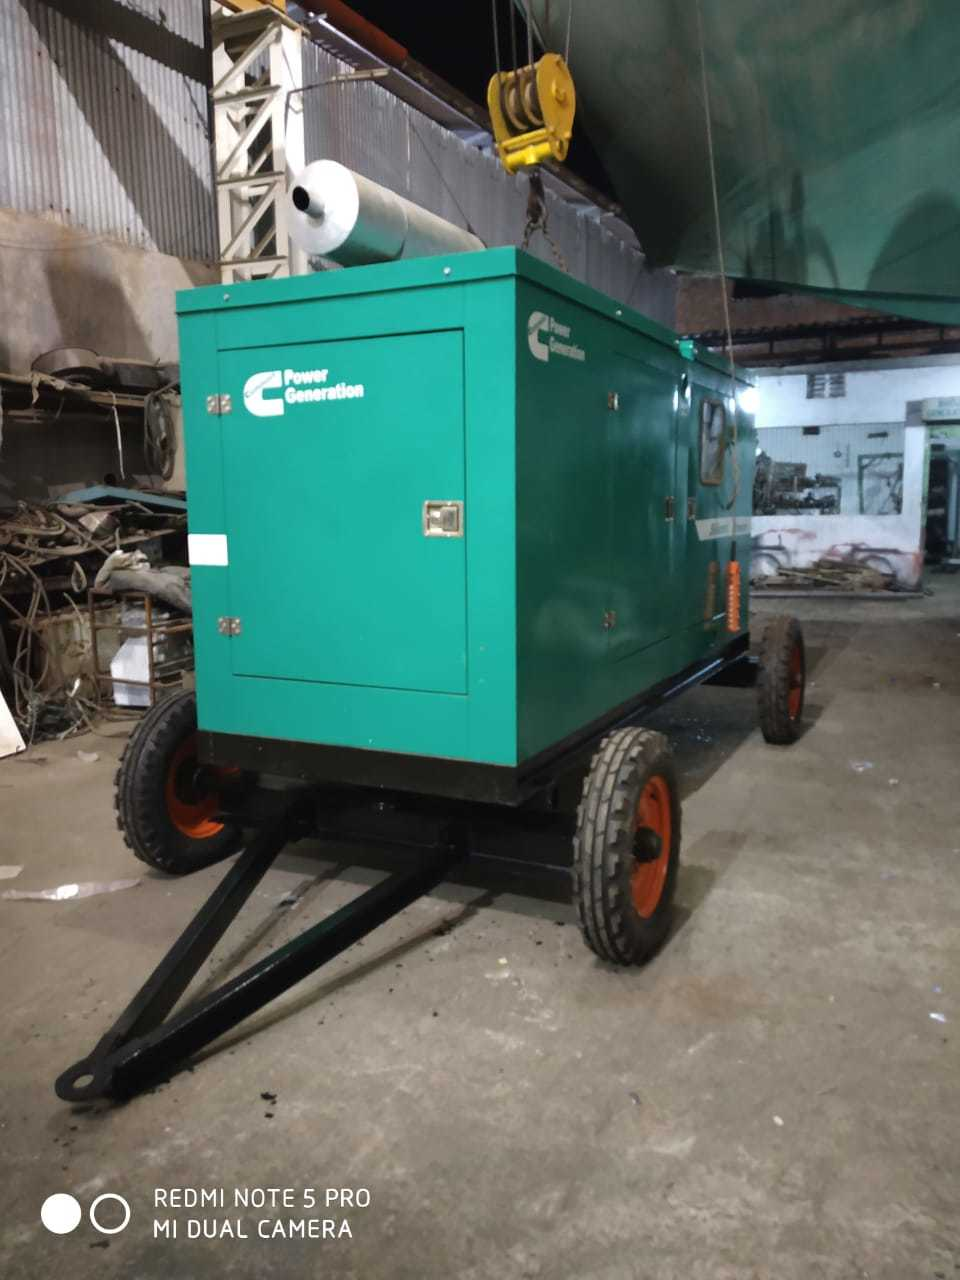 100 Kva Silent Cummins Generator Set With Trolly Supplier,100 Kva